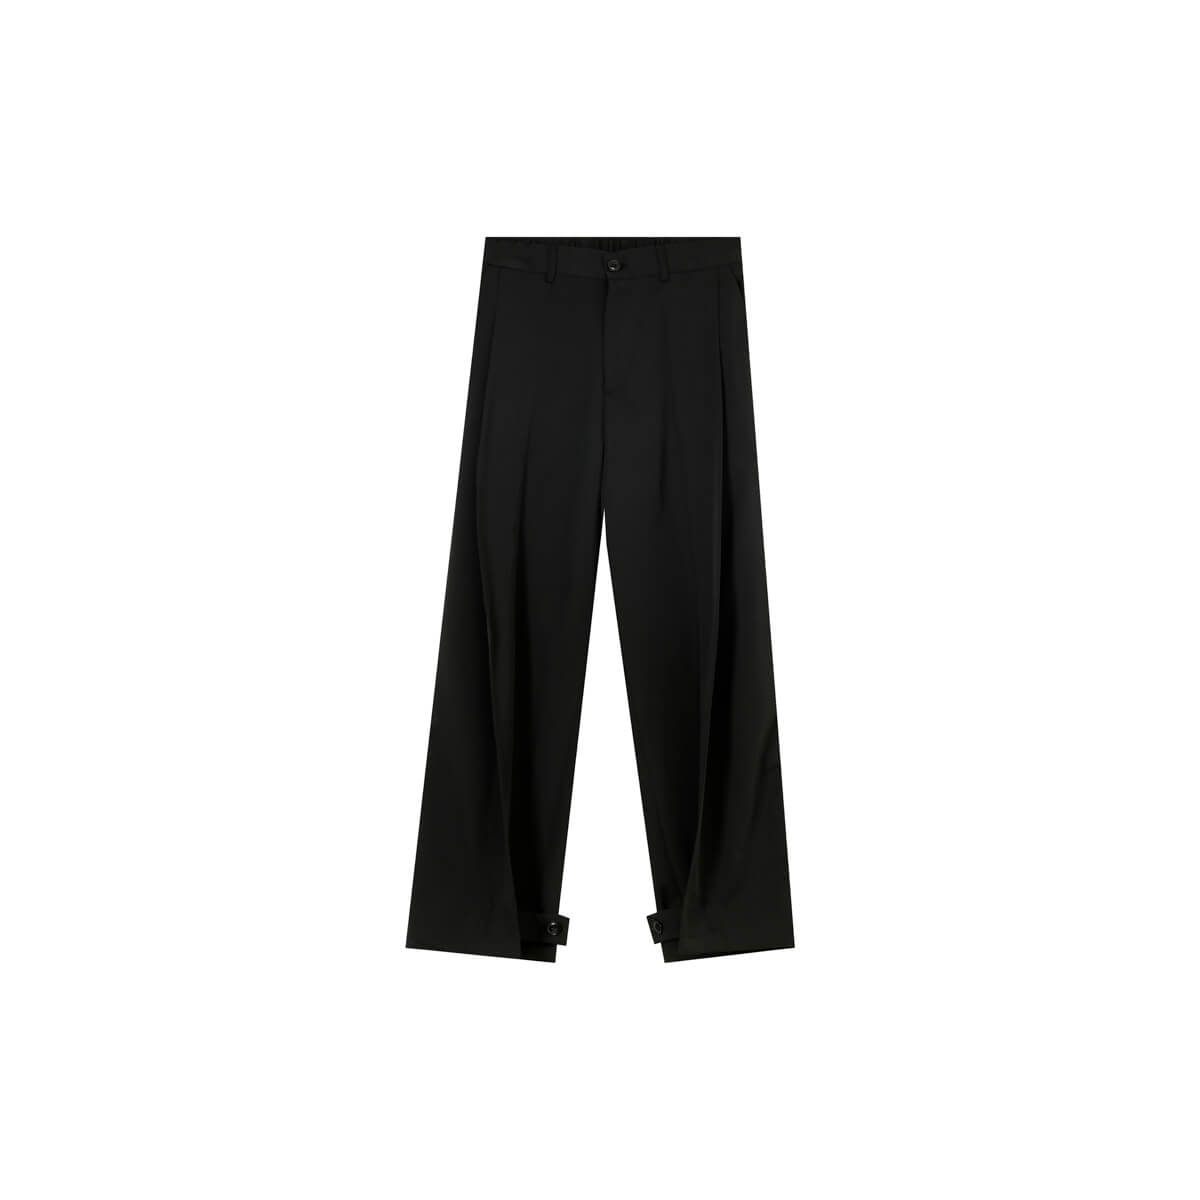 Брюки Cui Layout Studio Draped Crumple Trousers Black